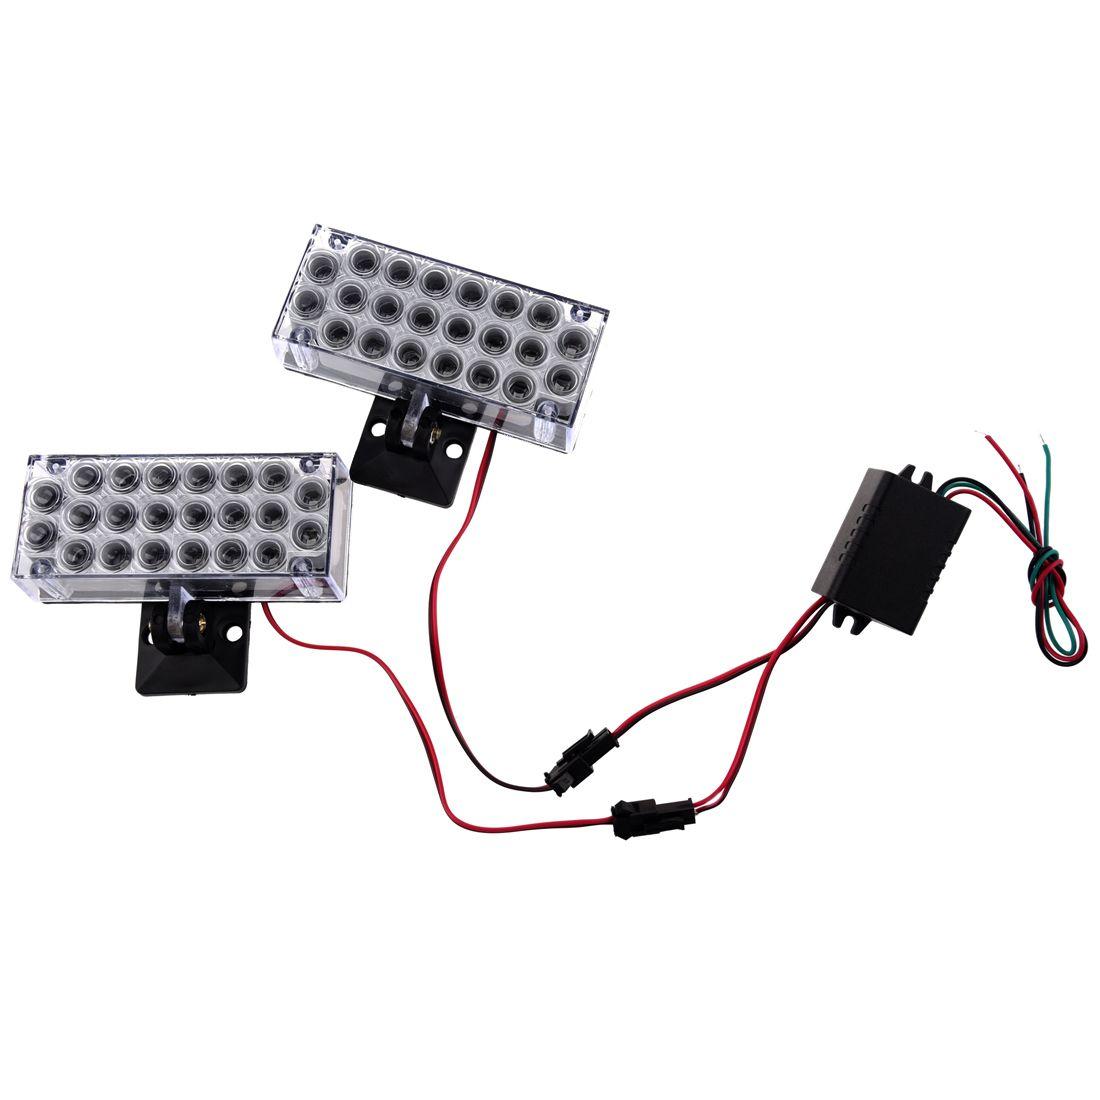 DSHA 2 x 22 LED Car Flashing Emergency Light Grill Strobe Flash Lamp 12V Red